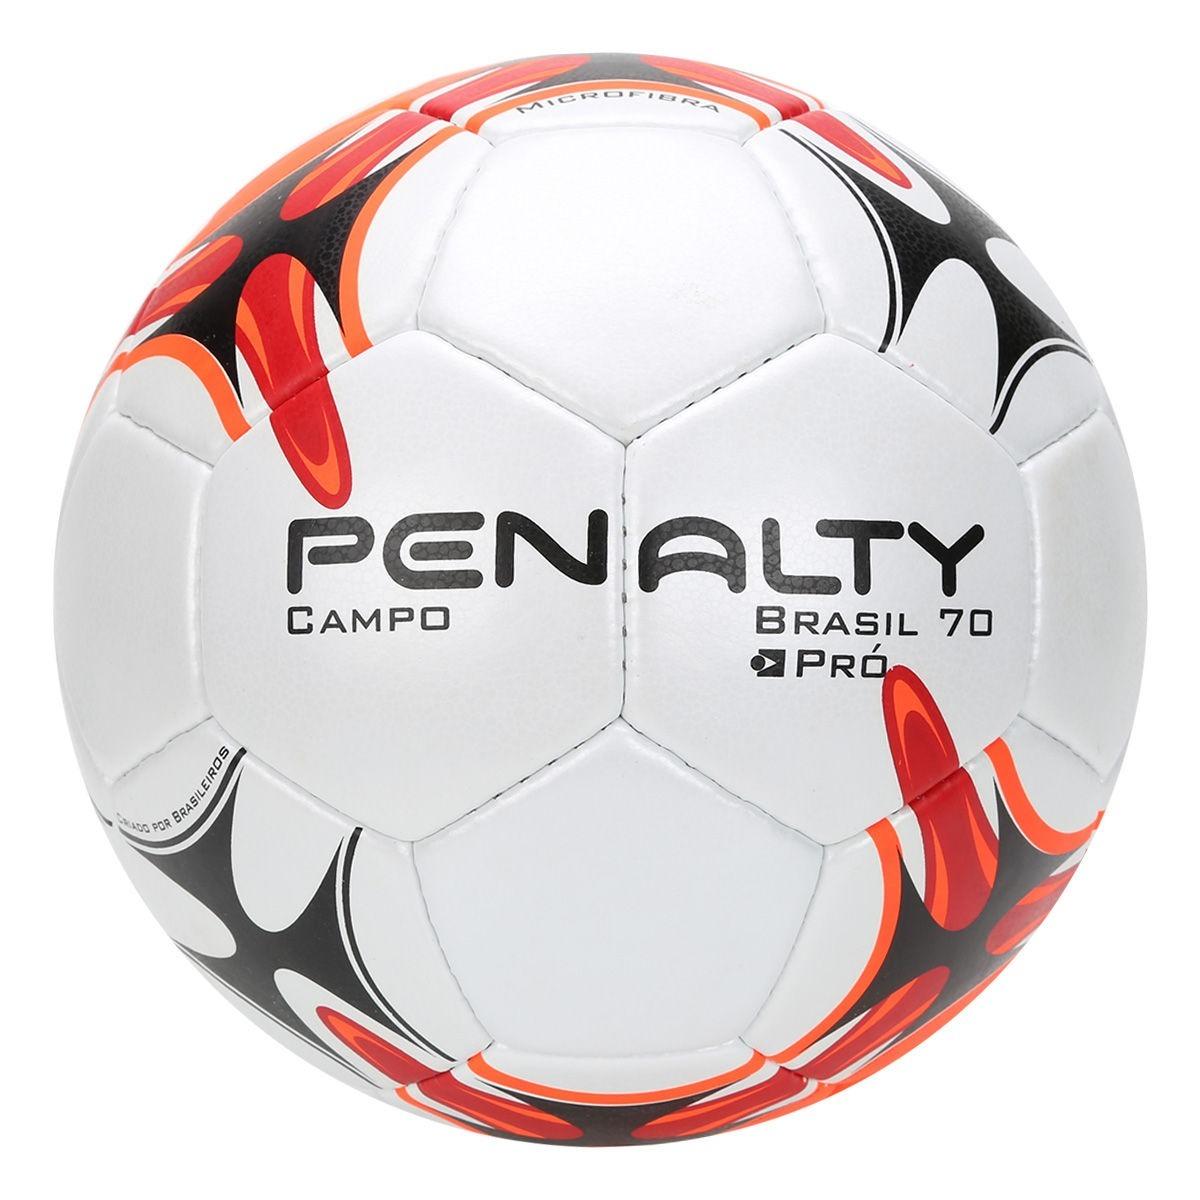 6cf21861e9 bola penalty futebol campo brasil 70 profissional 7 1magnus. Carregando  zoom.